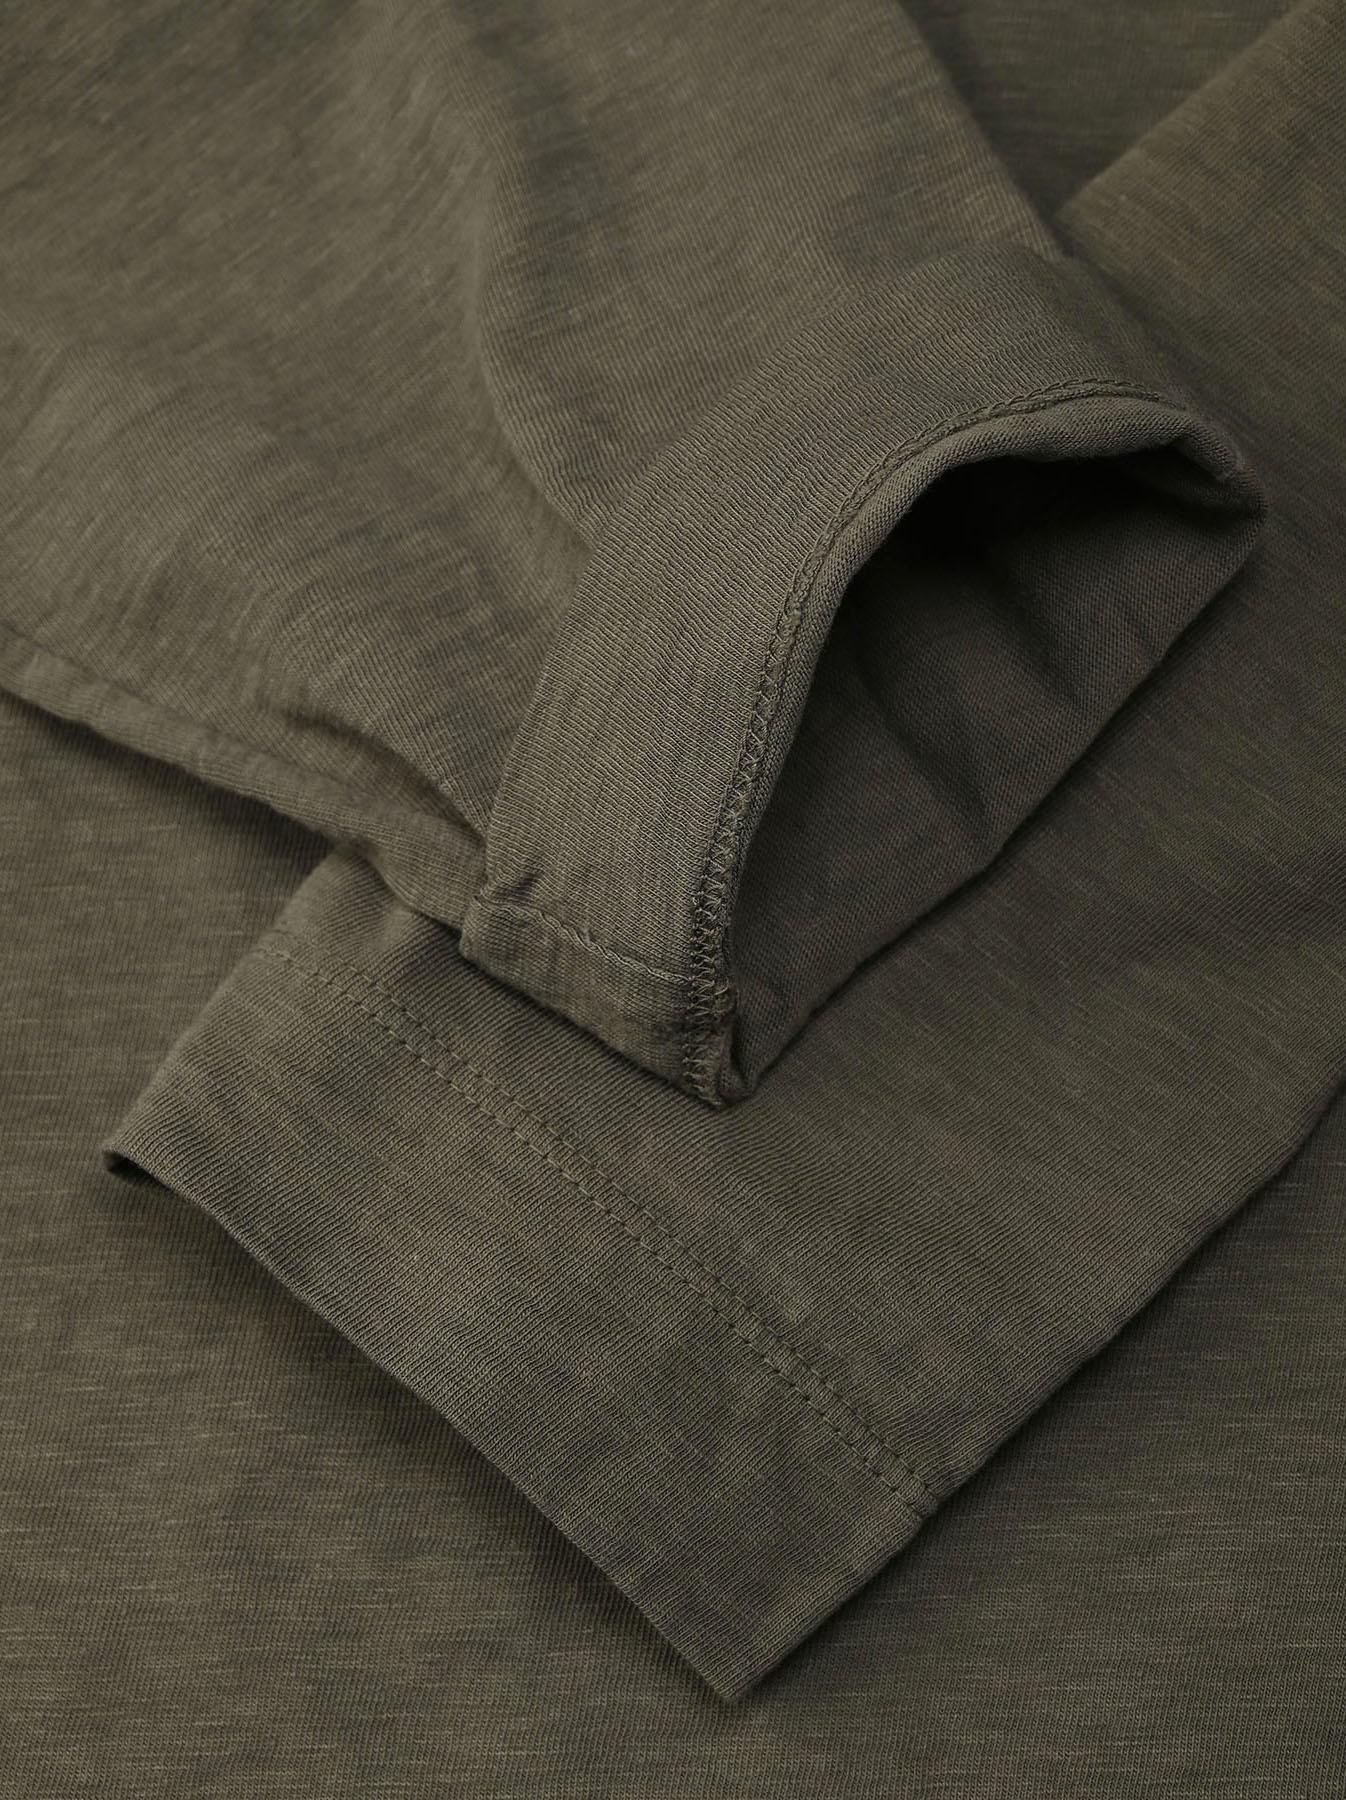 Zimbabwe Cotton Big Slit T-shirt (0721)-10